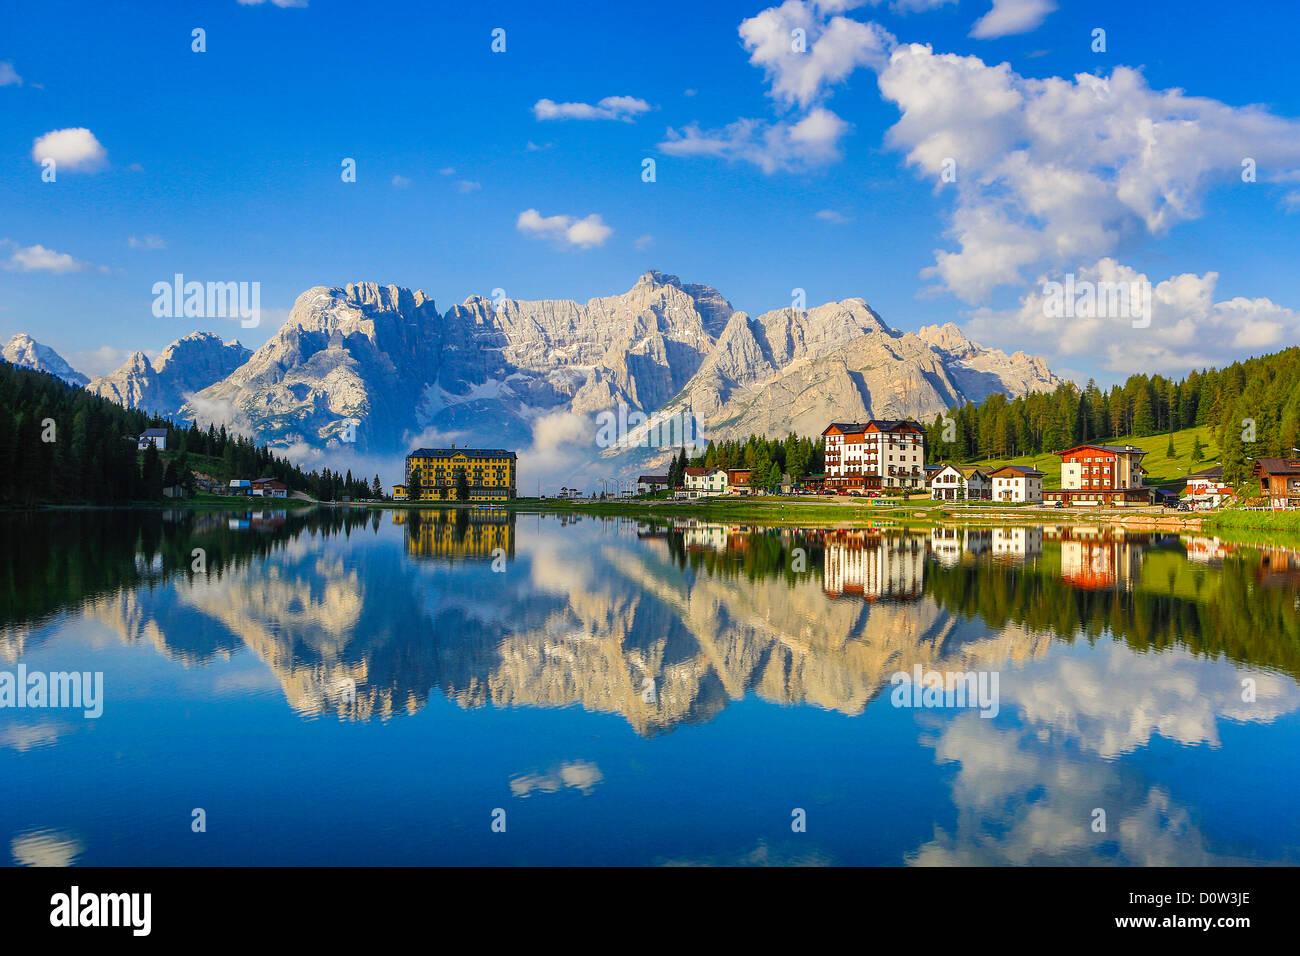 Italien, Europa, Reisen, Dolomiten, Alpen, Missurina, See, Tretboot, Wolken, bunt, Berge, Reflexion, Süd Tirol, Stockbild